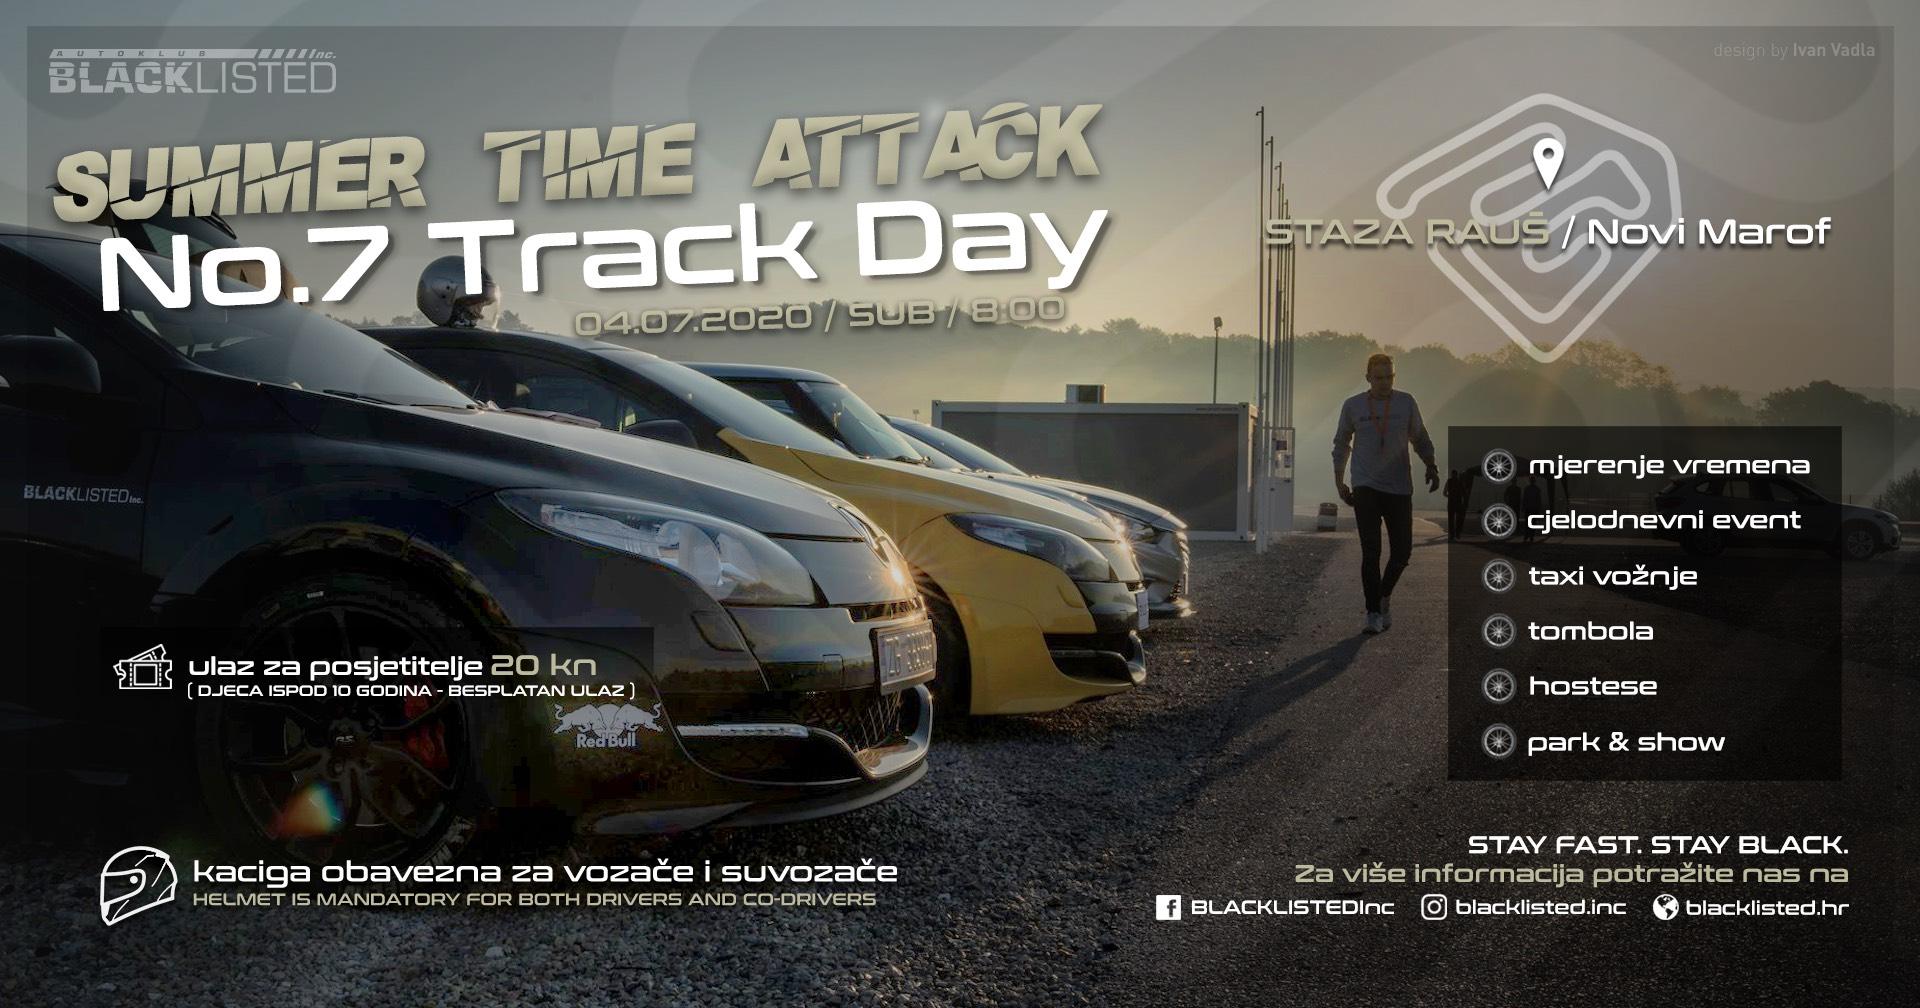 No. 7 track day letak